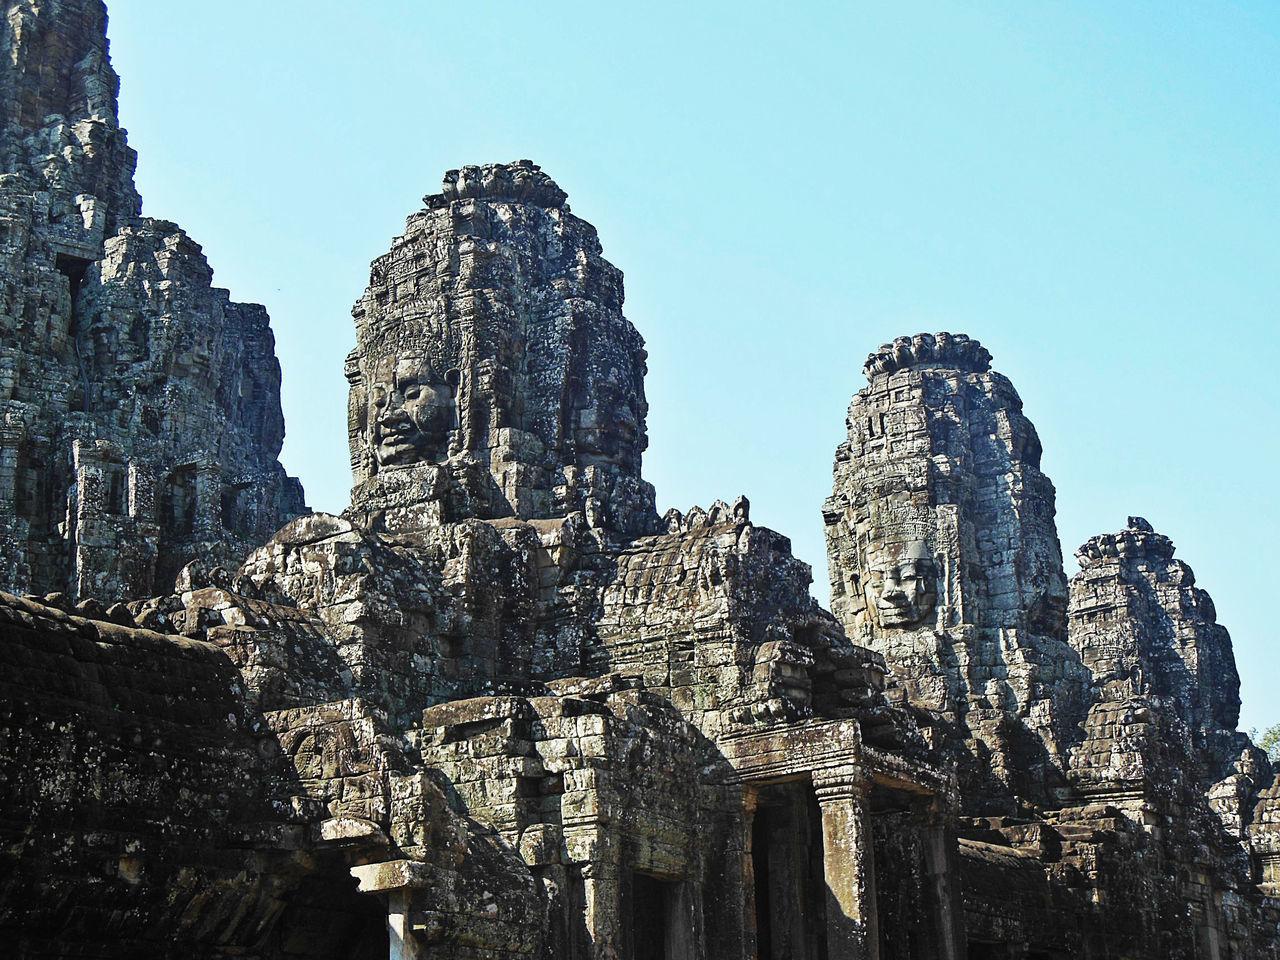 Ancient Architecture Ancient Civilization Angkor Thom Architecture Cambodia Eyeem Cambodia Eyeem History Khmer Empire No People Place Of Worship Tourism Travel Destinations